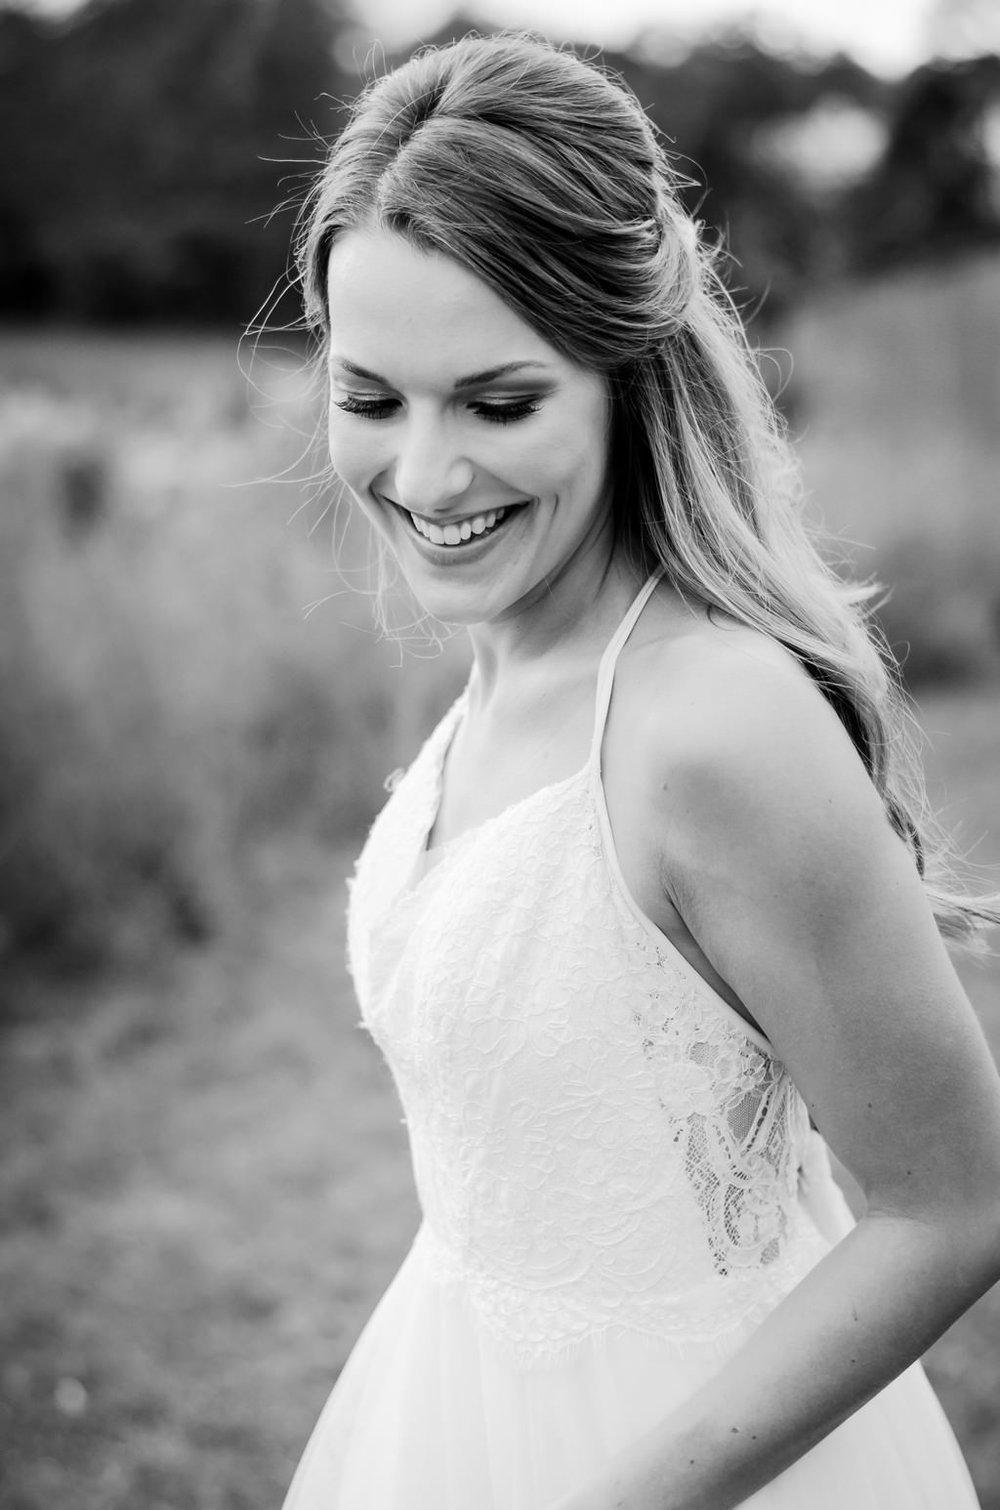 Iriswoods-Mt-Juliet-Blush-and-Burgundy-Nashville-Wedding-Photographer+18